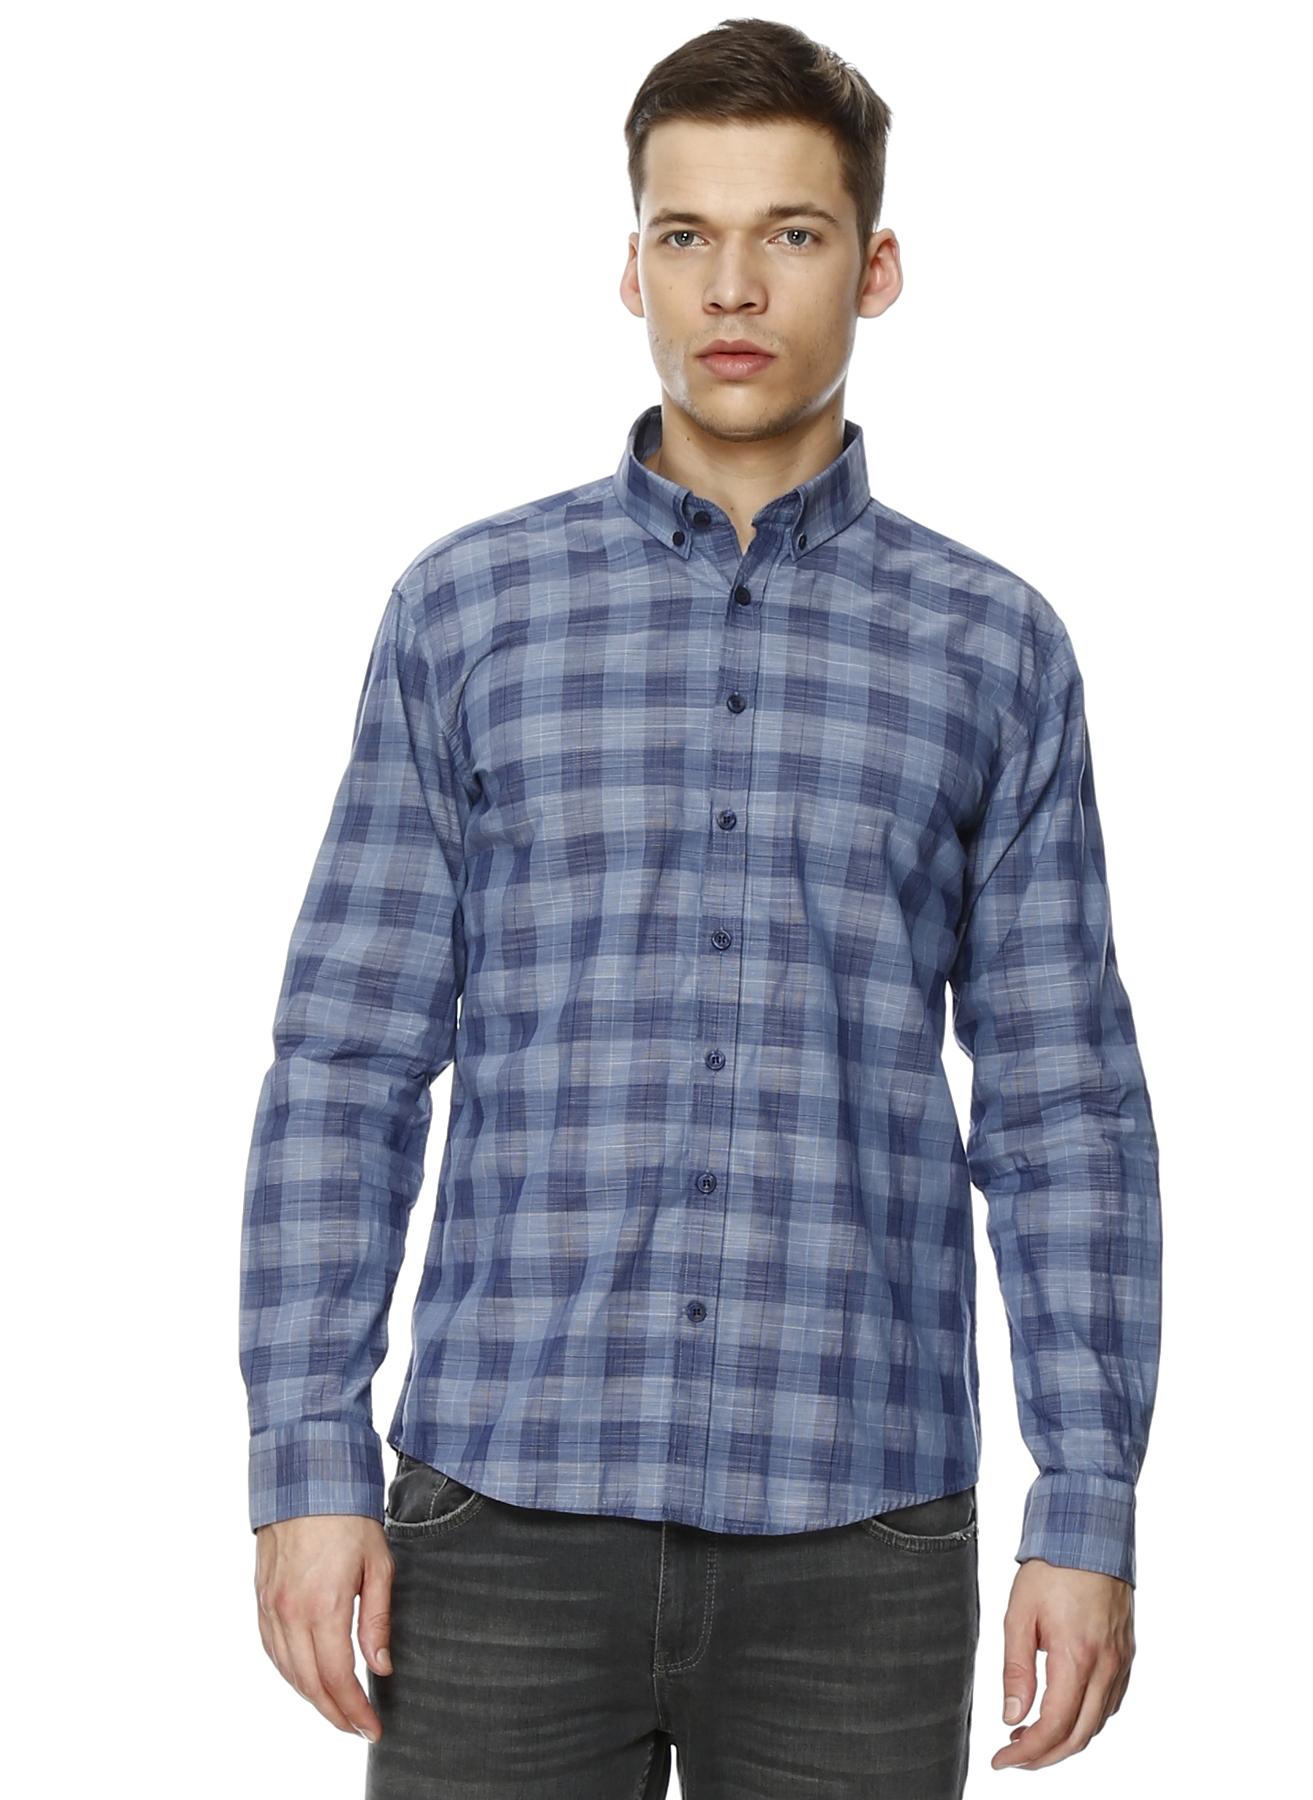 George Hogg Mavi Modern Fit Kareli Gömlek 42 5000205498004 Ürün Resmi